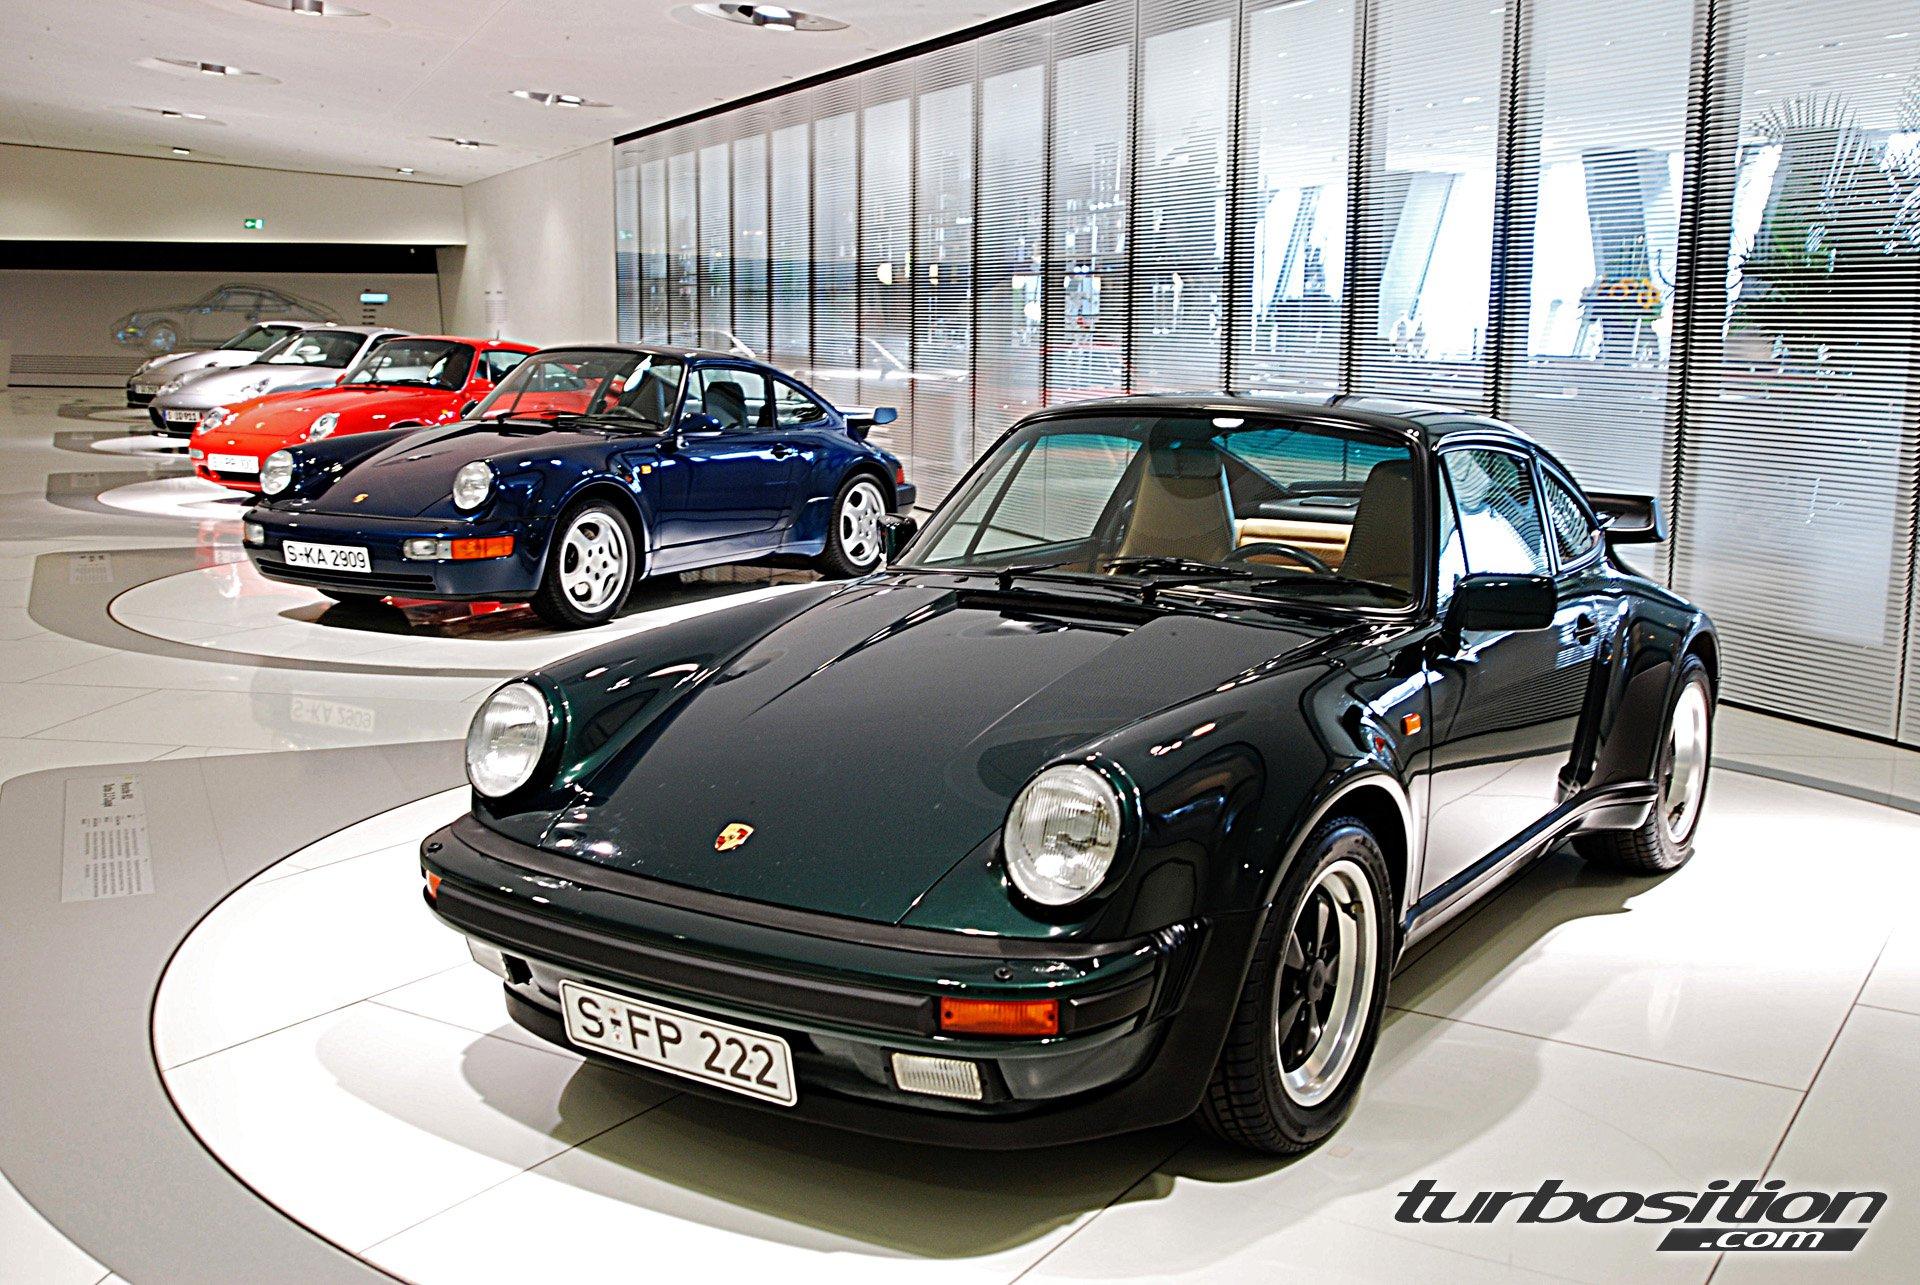 Porsche Museum In Stuttgart Zuffenhausen Turbosition